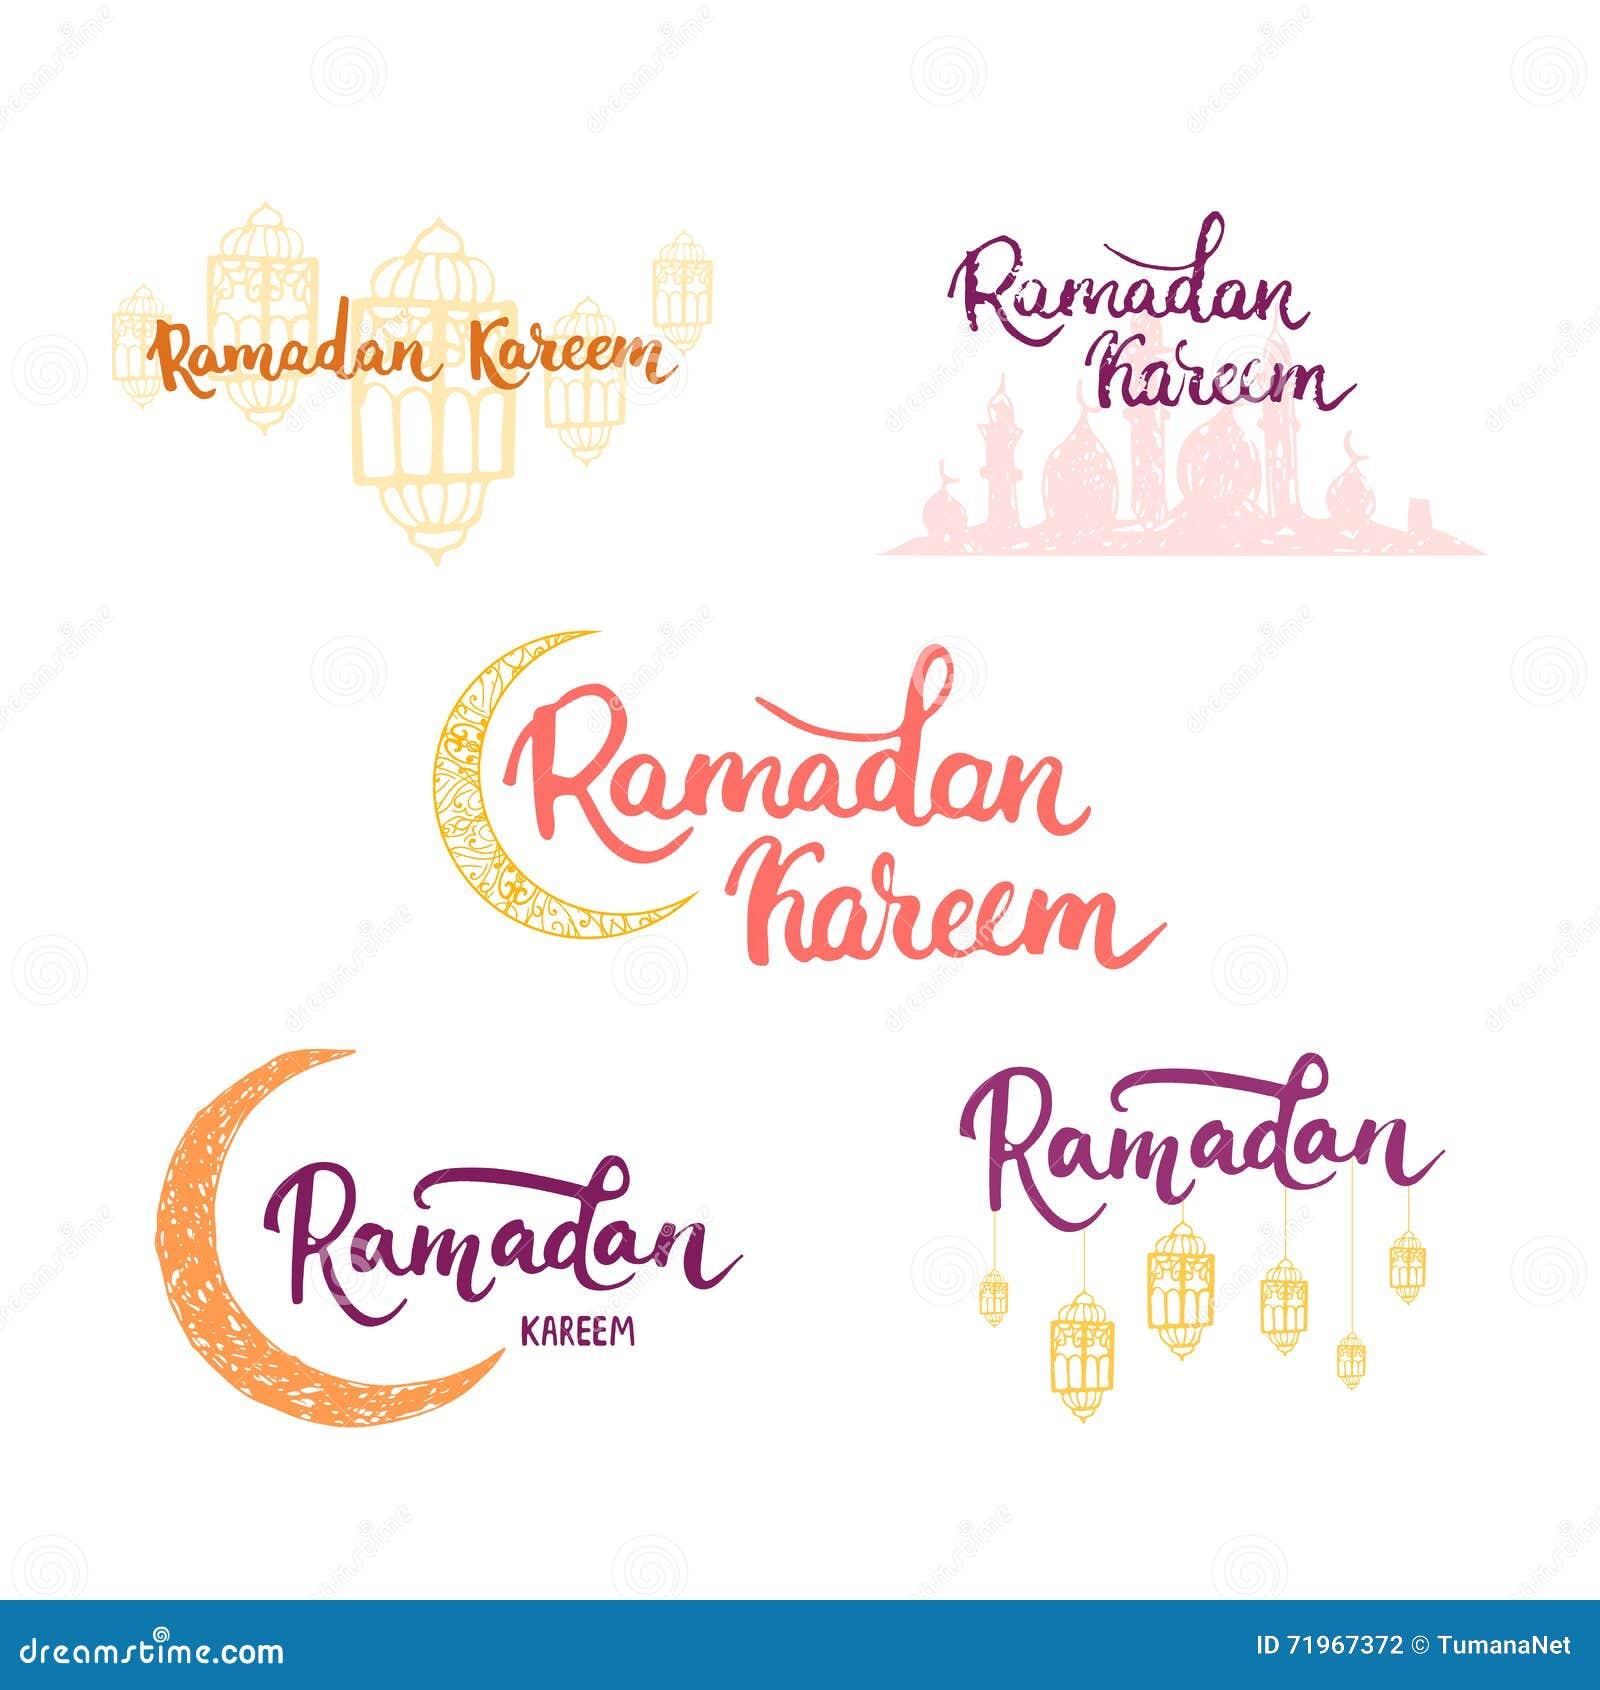 Ramadan kareem greeting cards set background with moon lanterns ramadan kareem greeting cards set background with moon lanterns lettering and mosque vector illustration for ramadan kristyandbryce Gallery